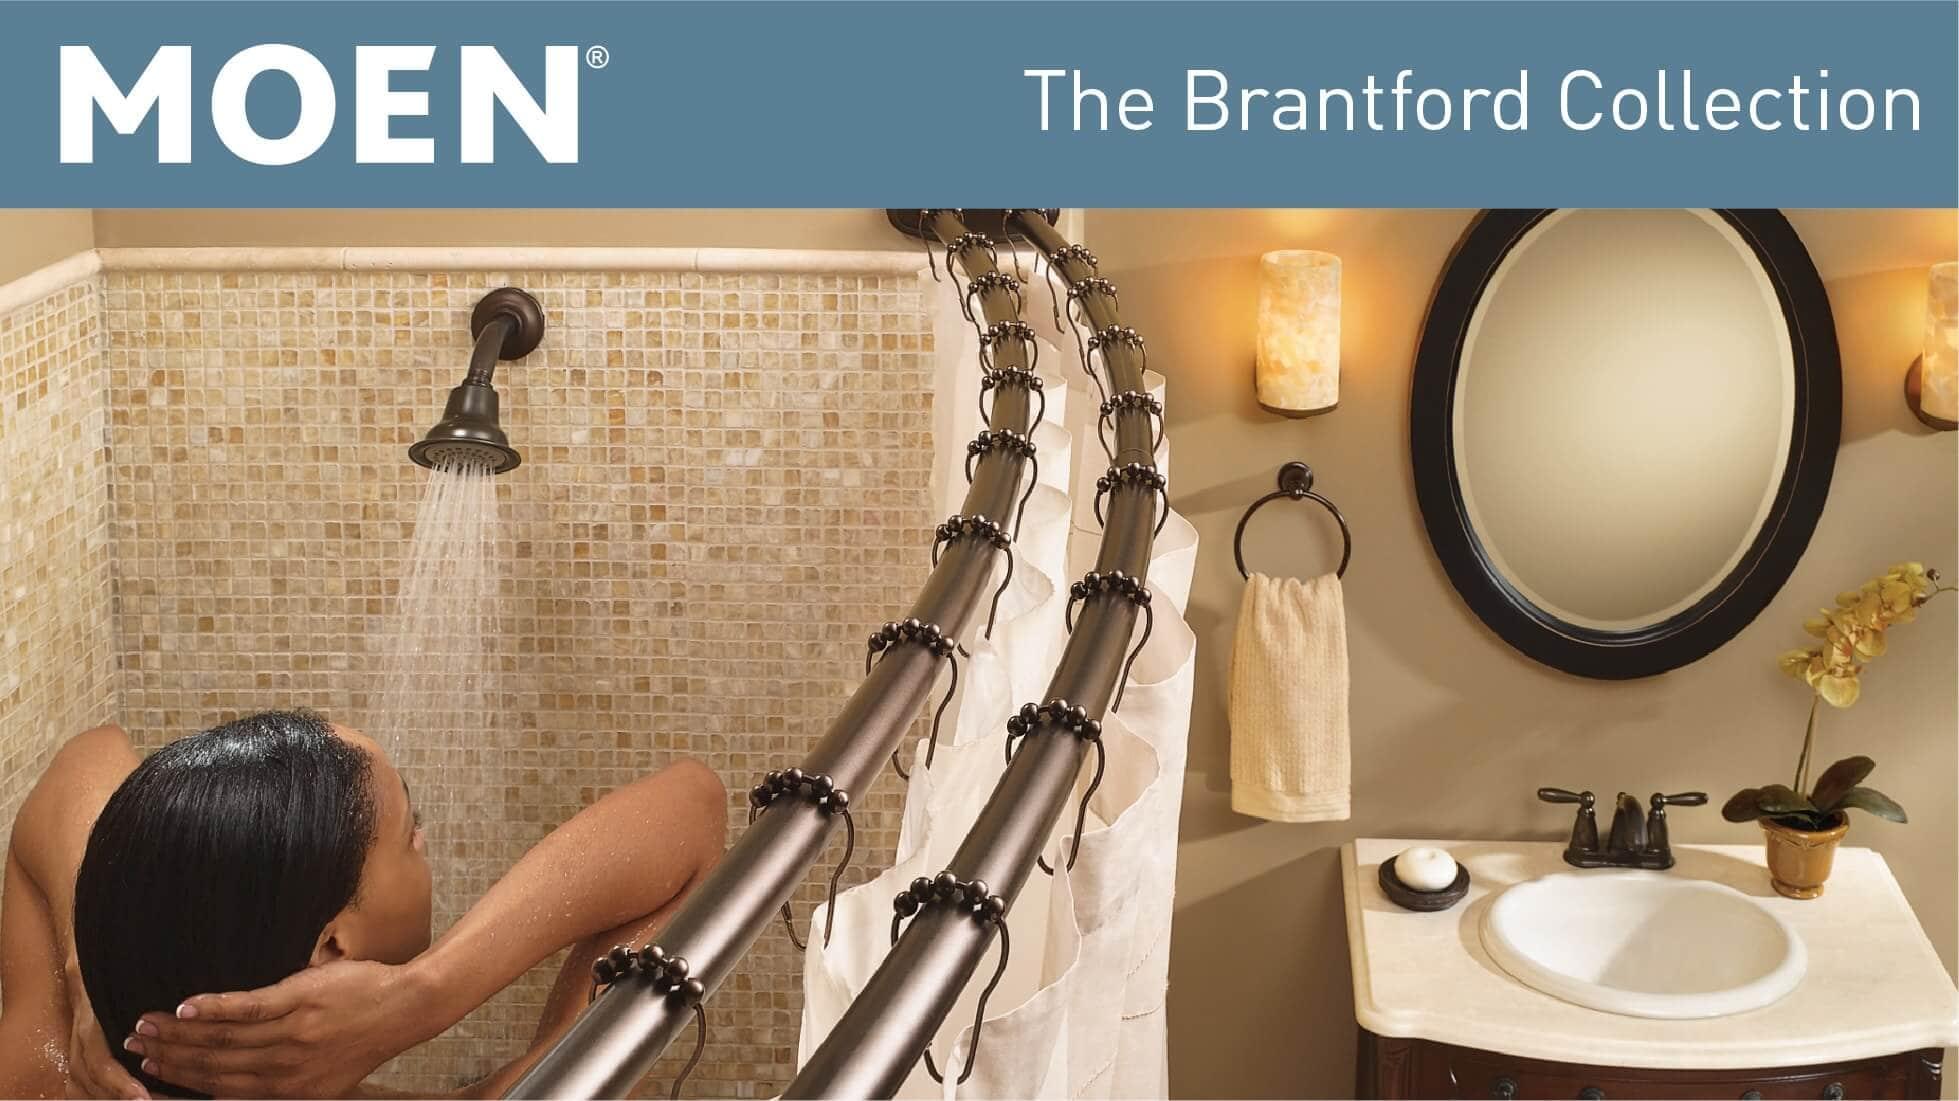 Bratford Collection